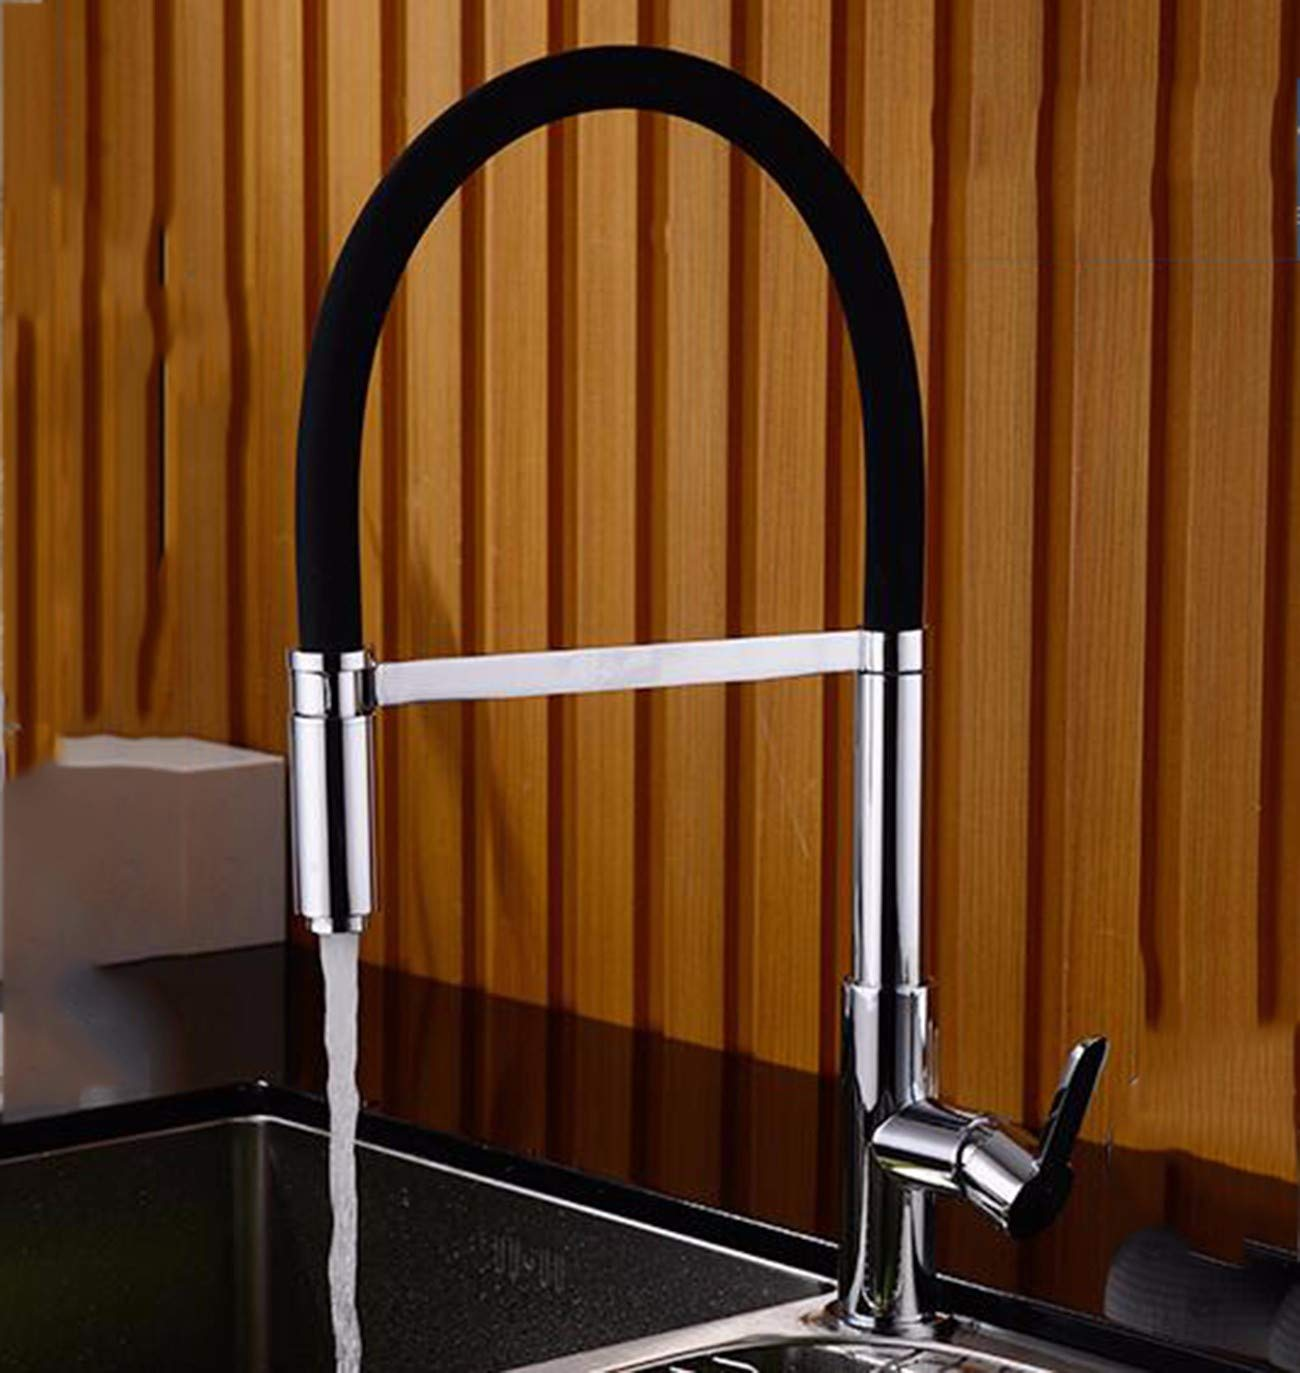 C All Copper Kitchen Faucet Vegetable Basin Faucet Kitchen Tap Faucet Hot And Cold Copper Tap. A